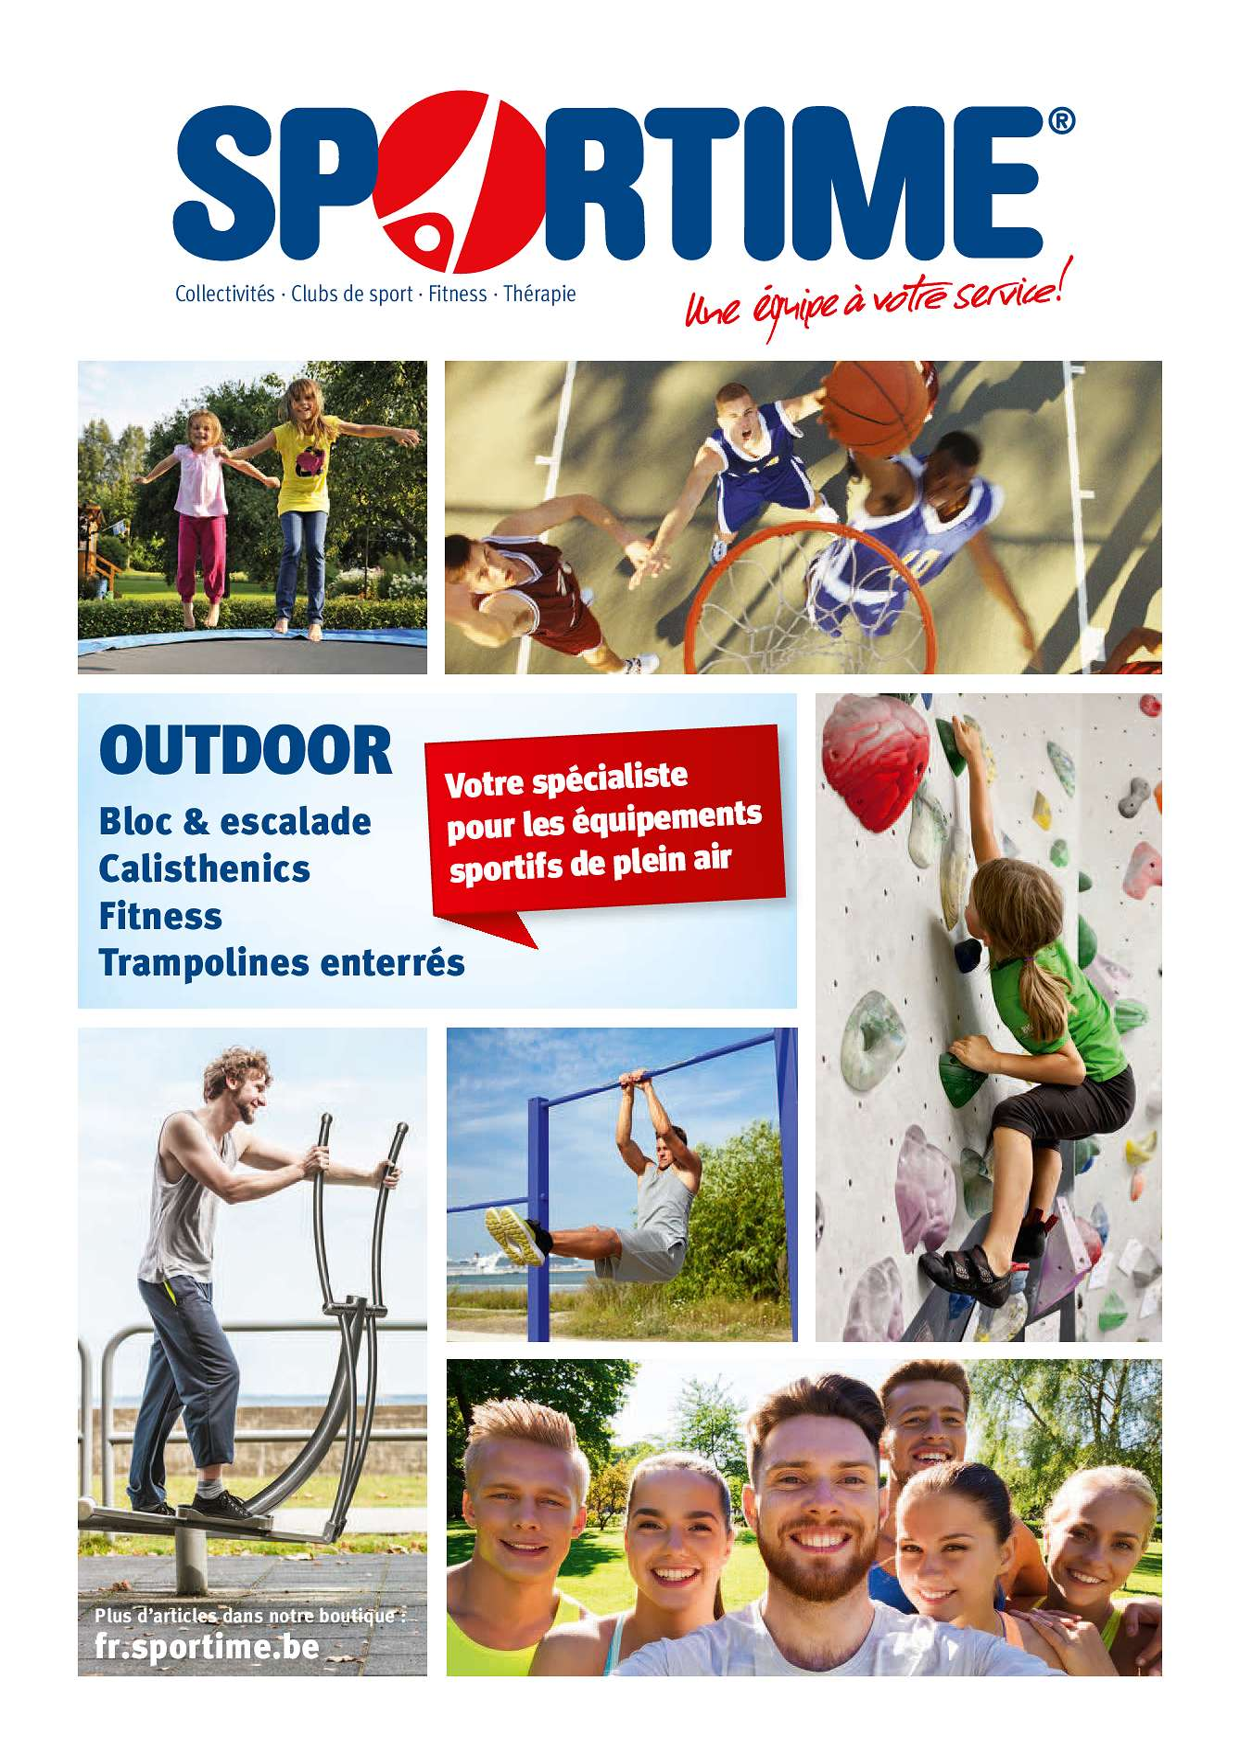 Sport-Thieme® OUTDOOR-Installations sportives PDF